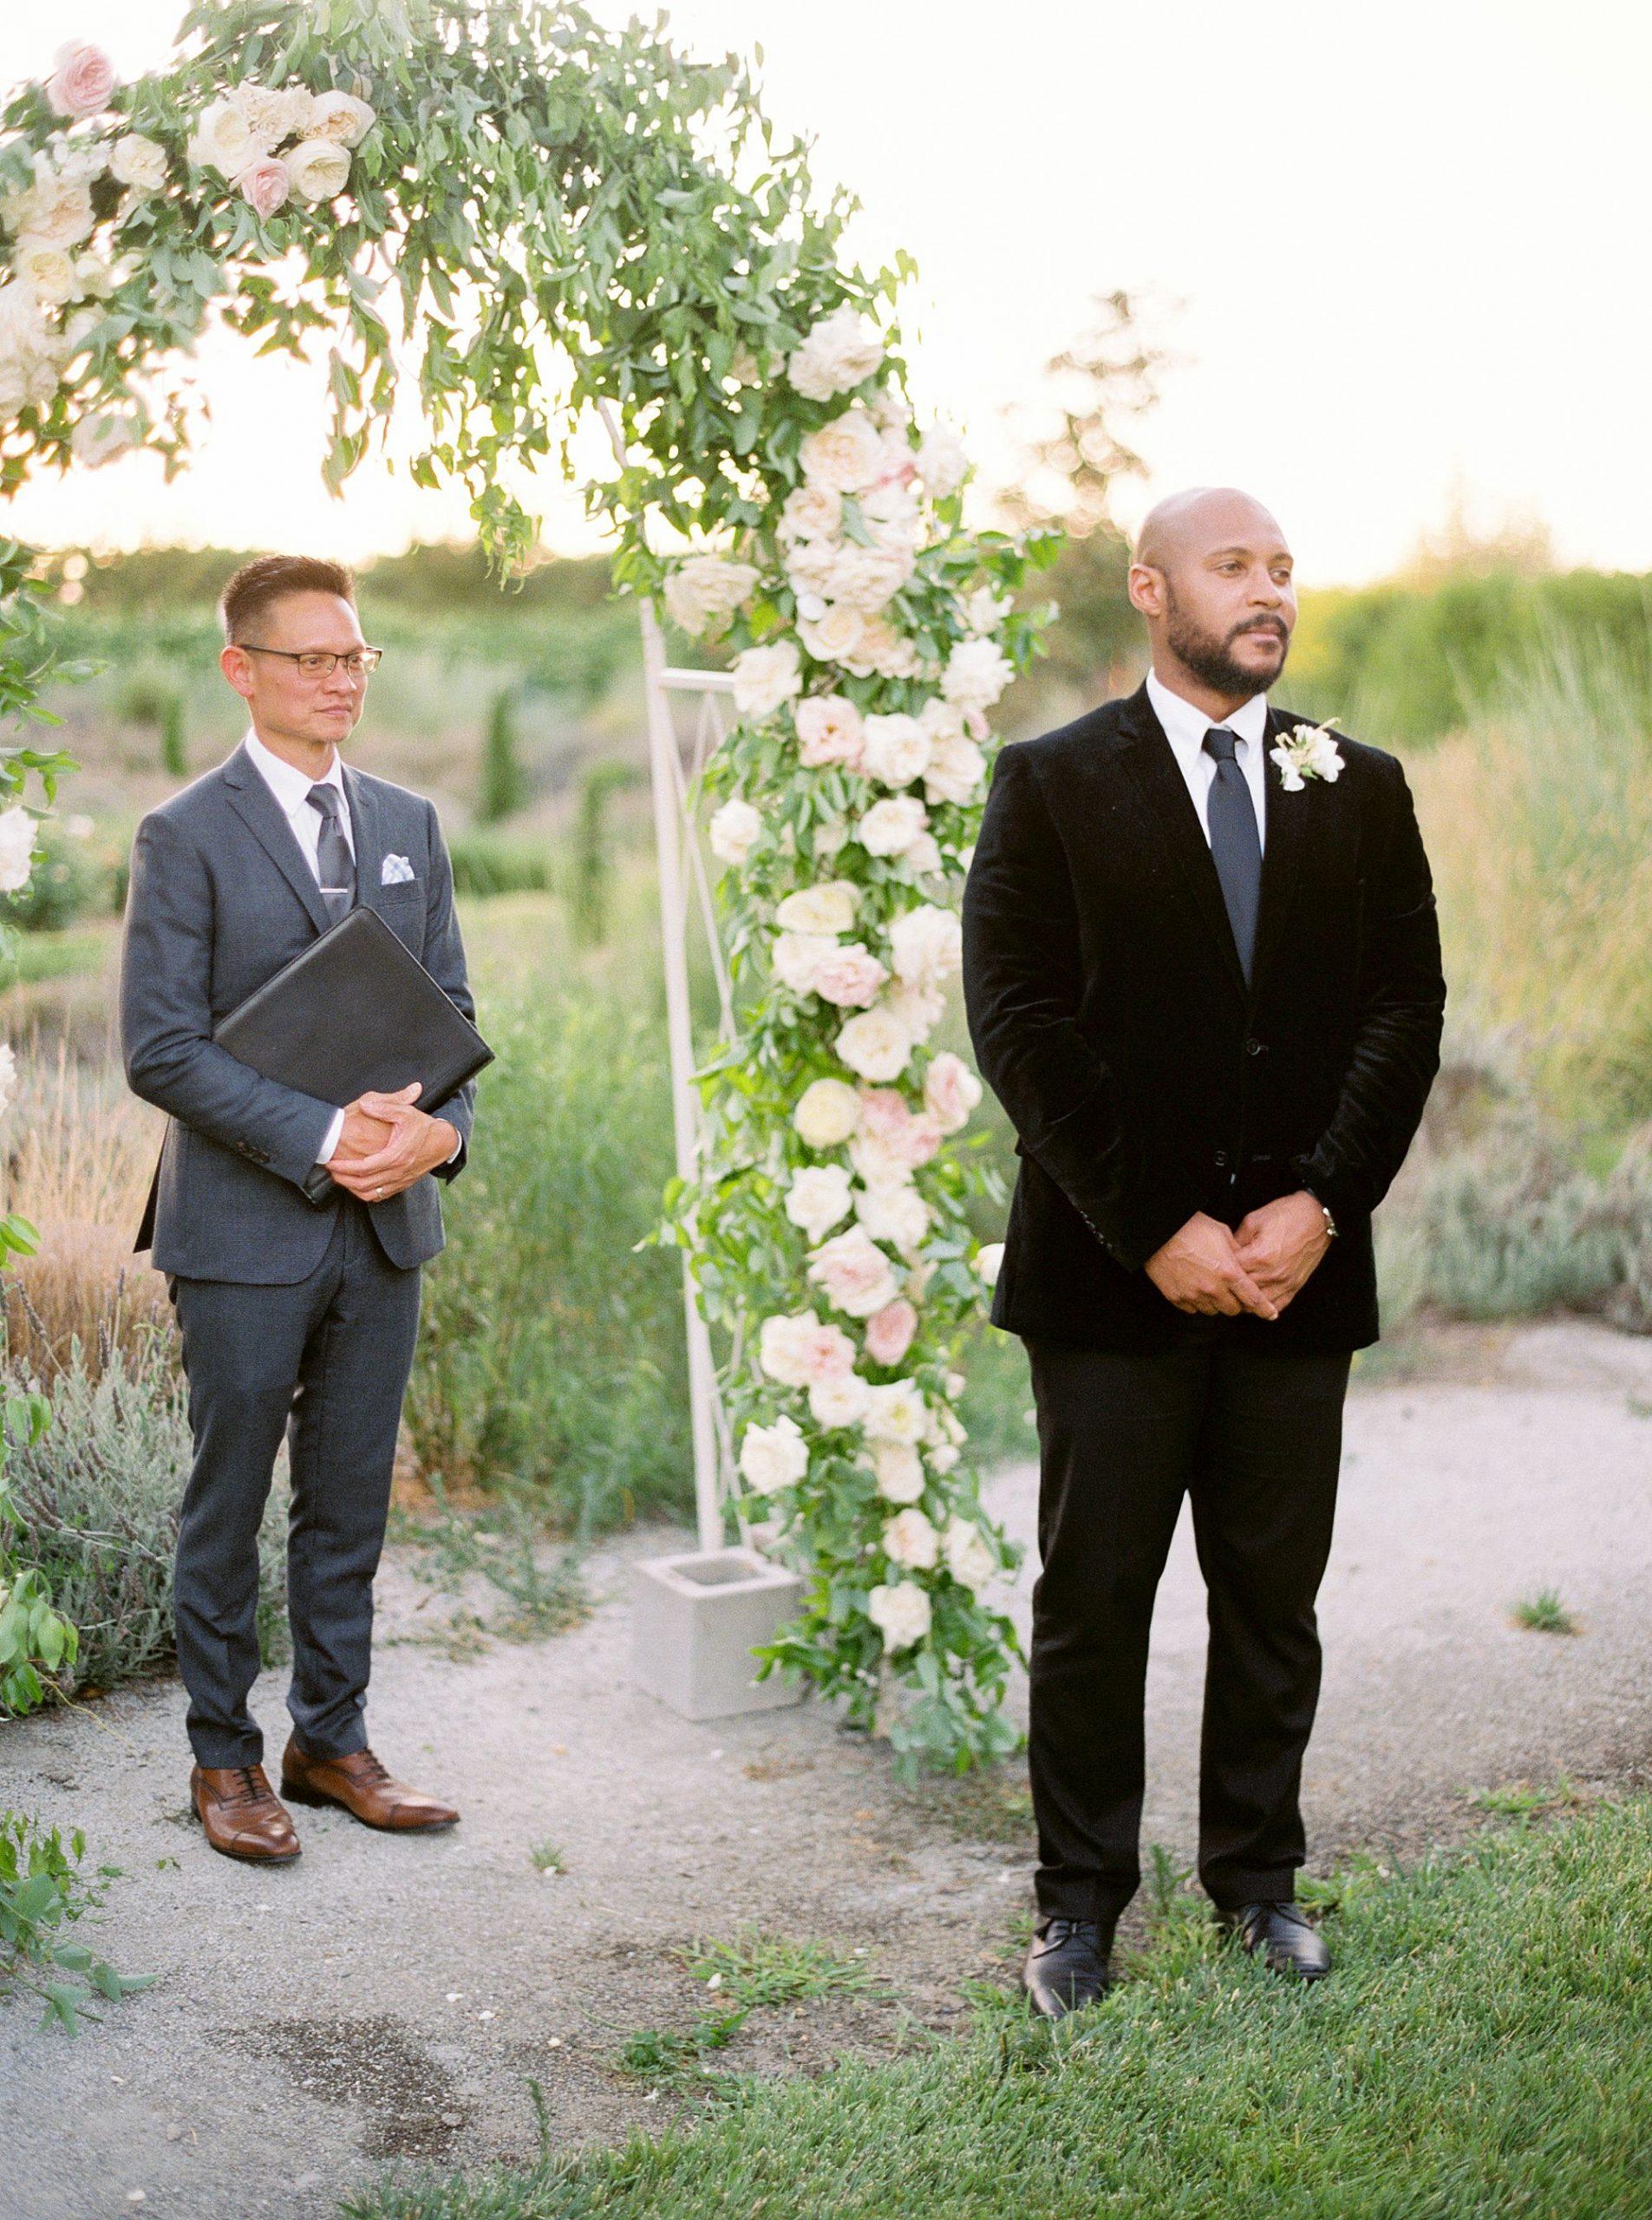 Park Winters Micro-Wedding Inspiration on Style Me Pretty - Stephanie Teague Events - Ashley Baumgartner - Park Winters Wedding - Black Tie Wedding - Micro-Wedding Sacramento Photographer_0070.jpg